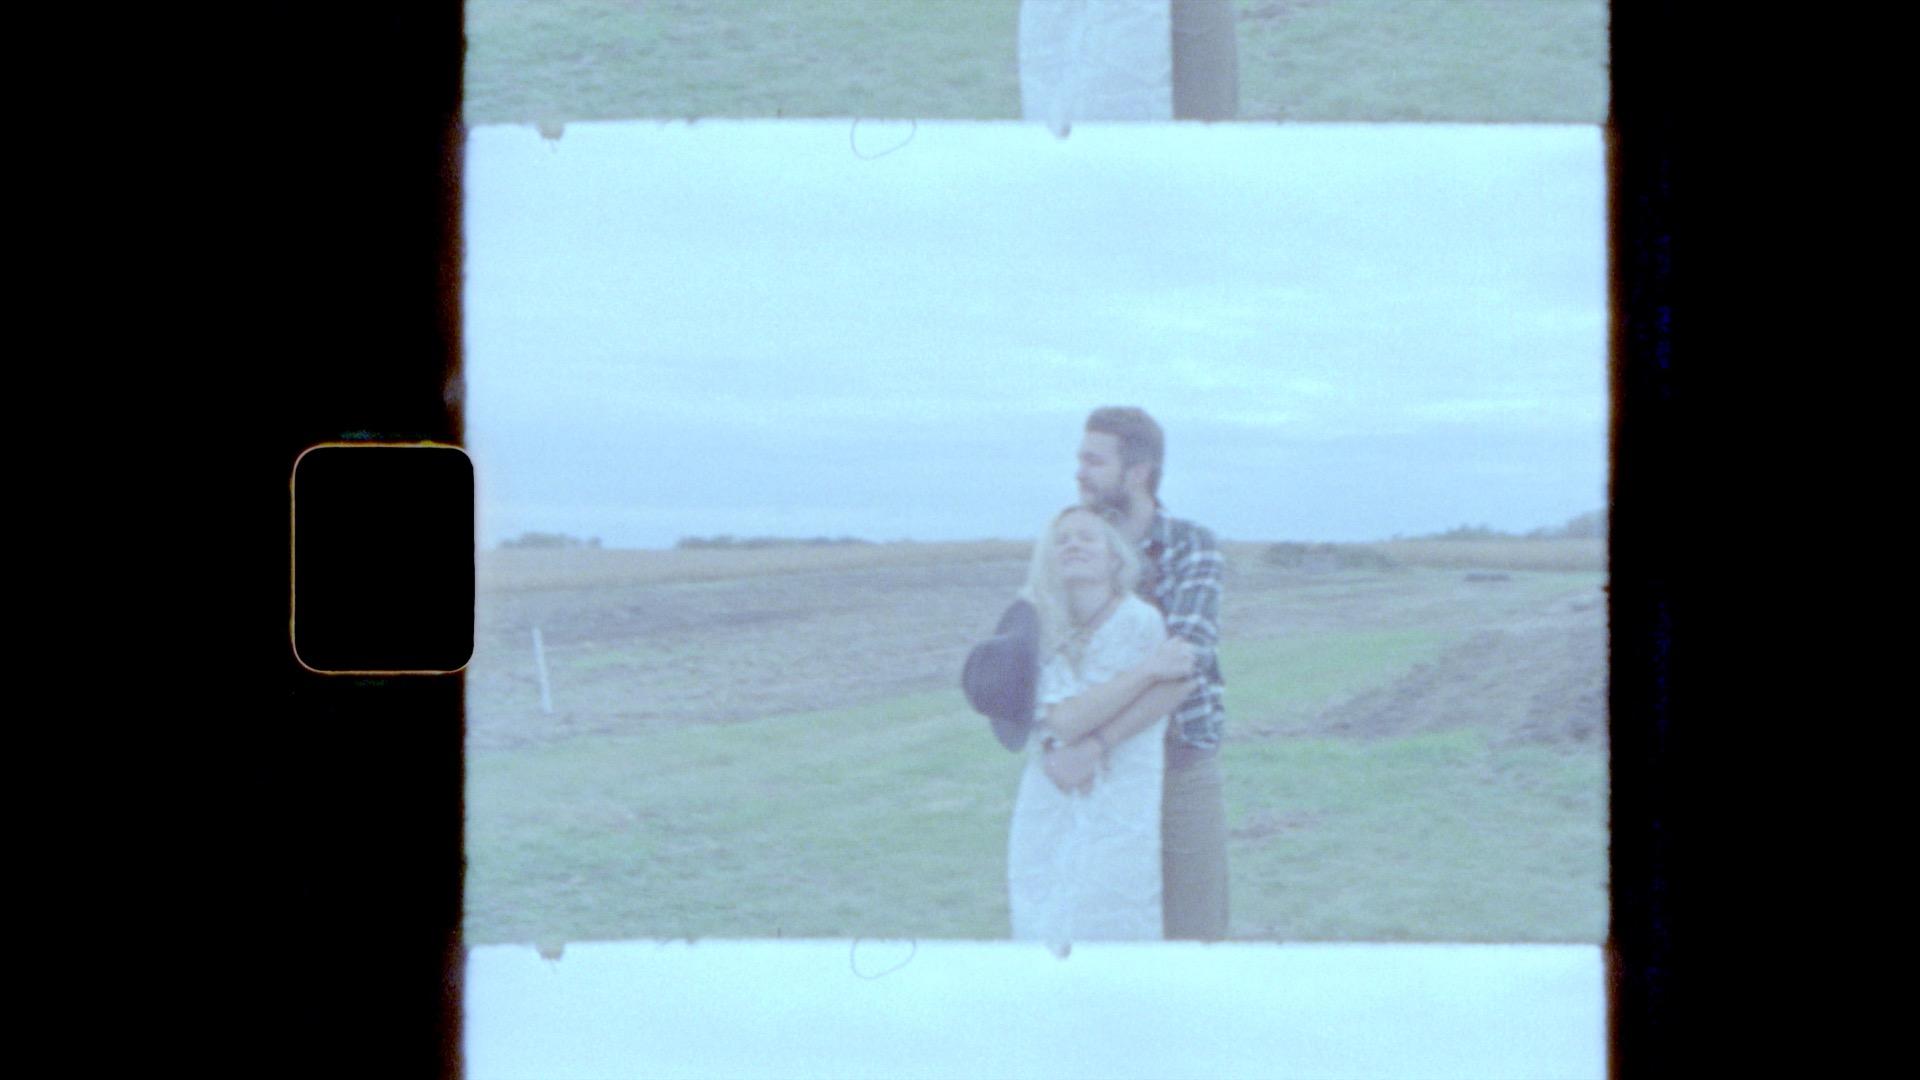 SUPER_8_FILMS1033.JPG